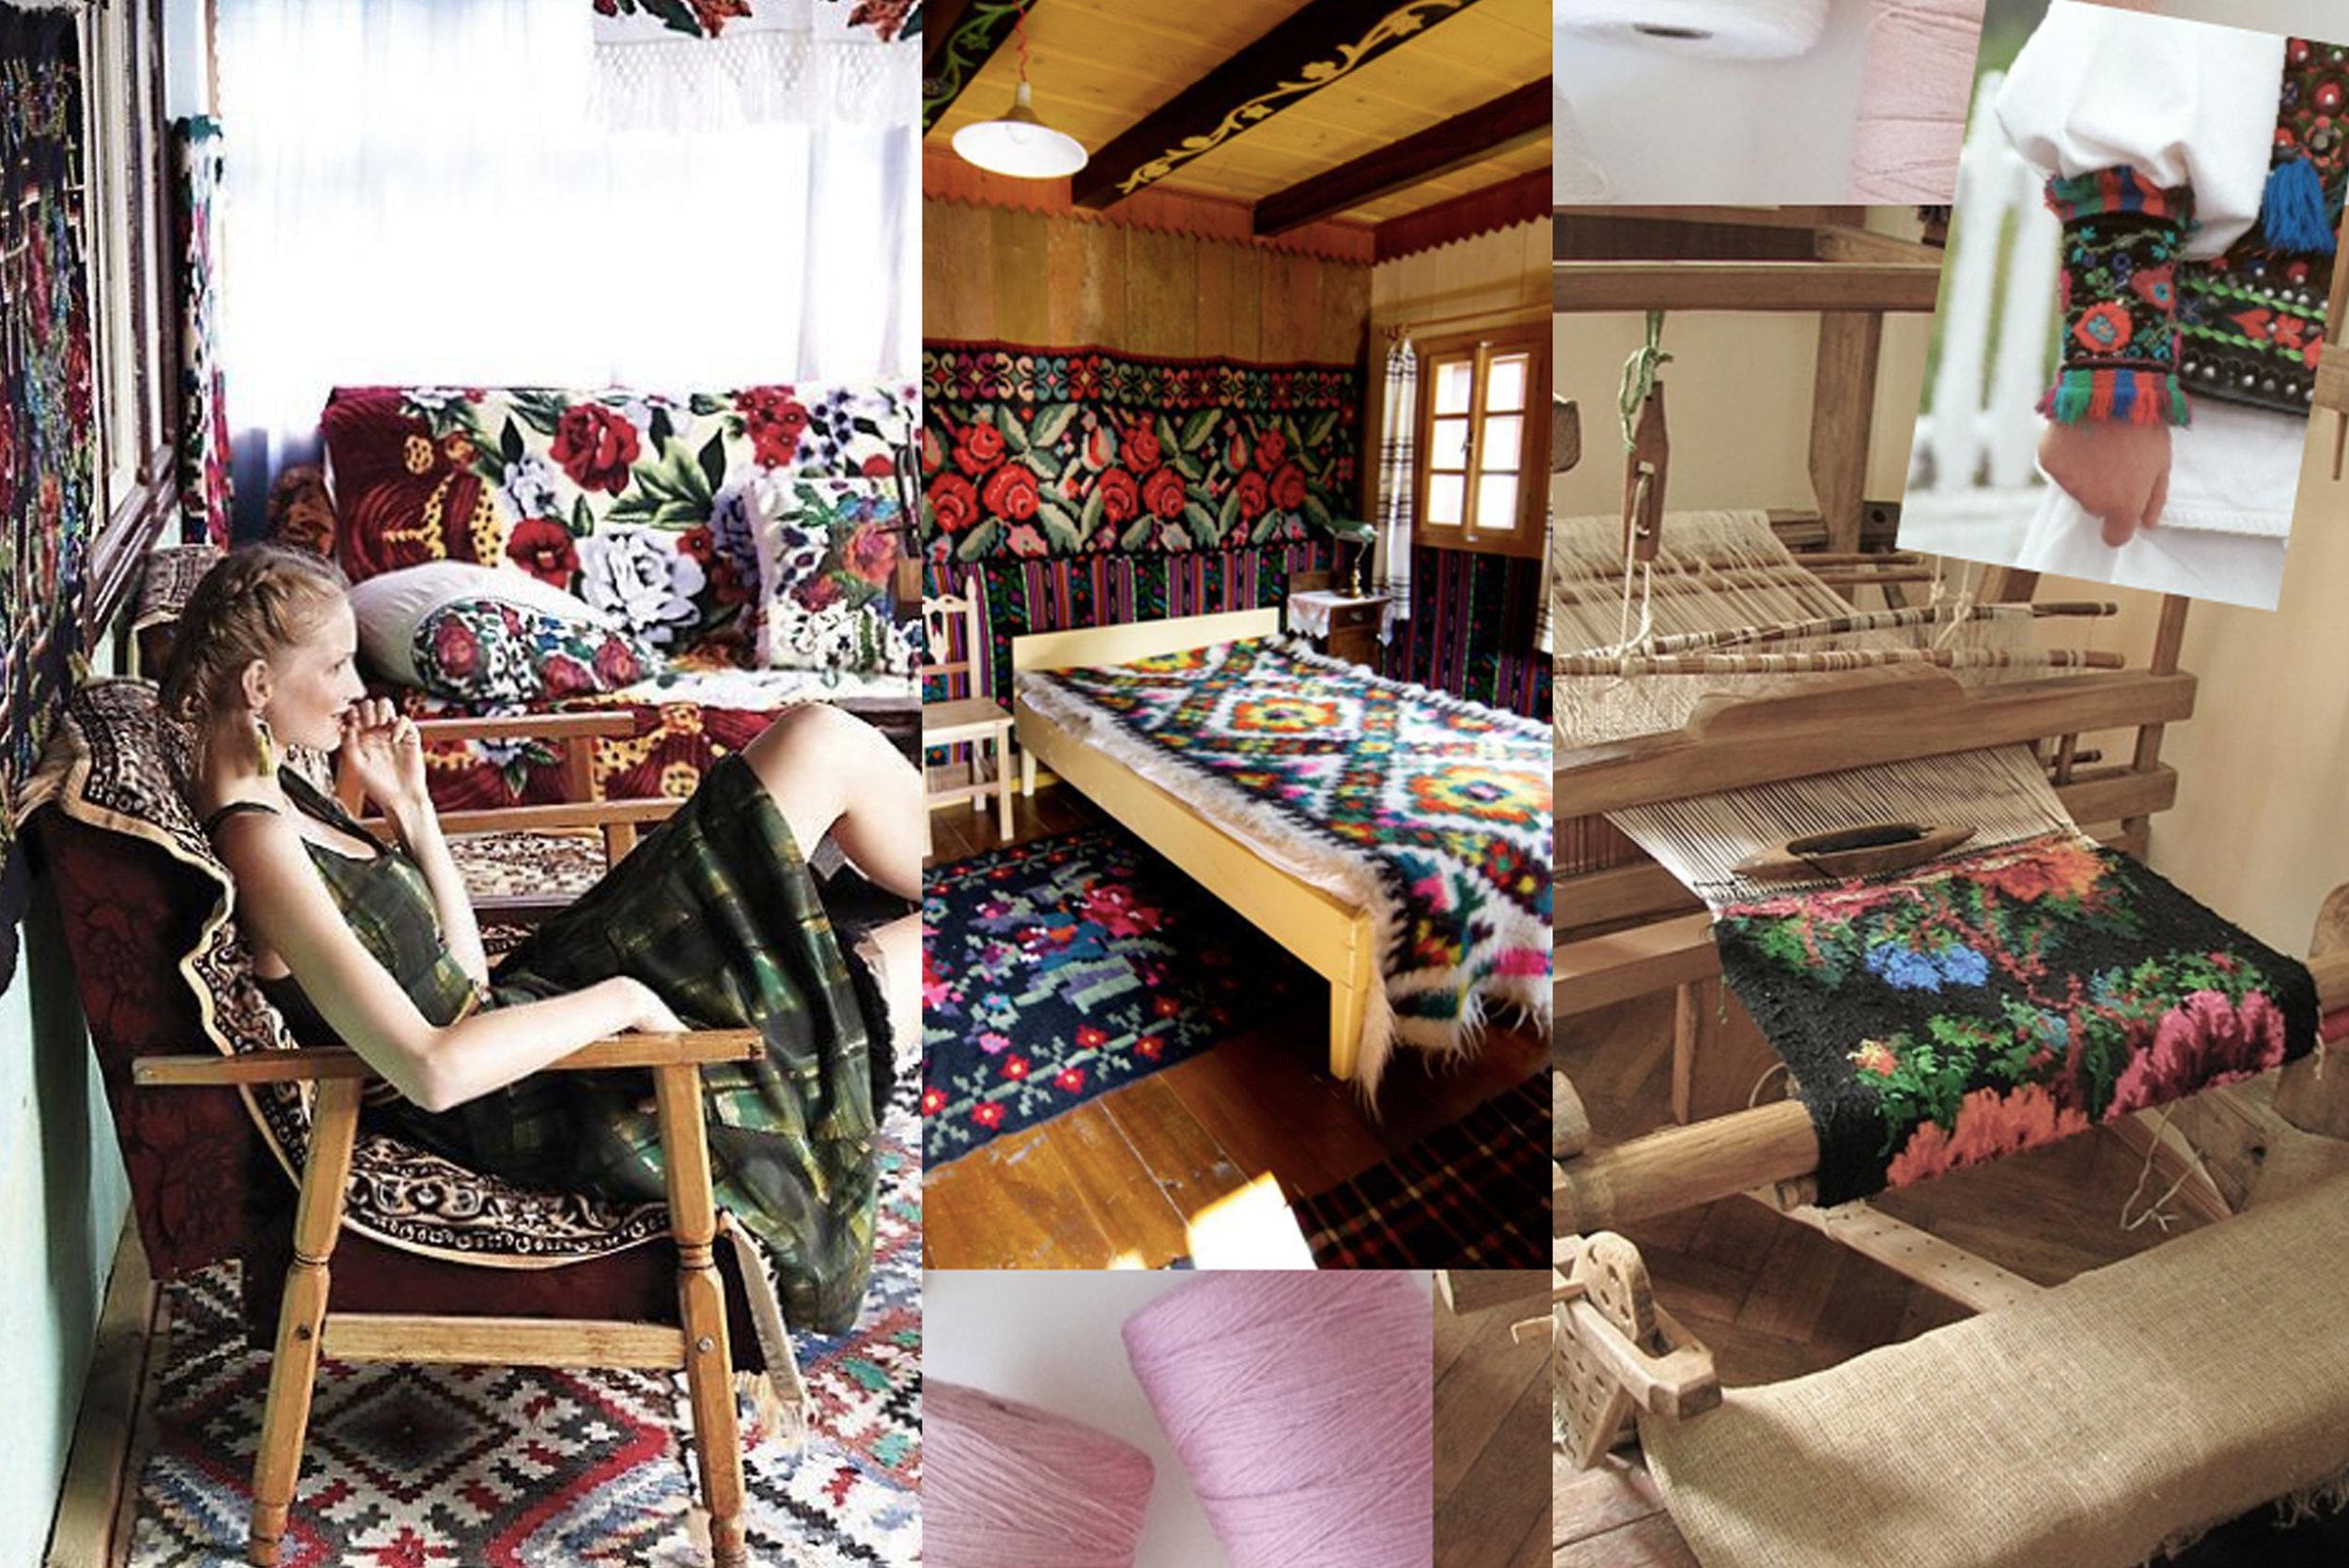 fashion shoot in Romania  Anthropologie  - interior with rugs via  Gypsy Yaya